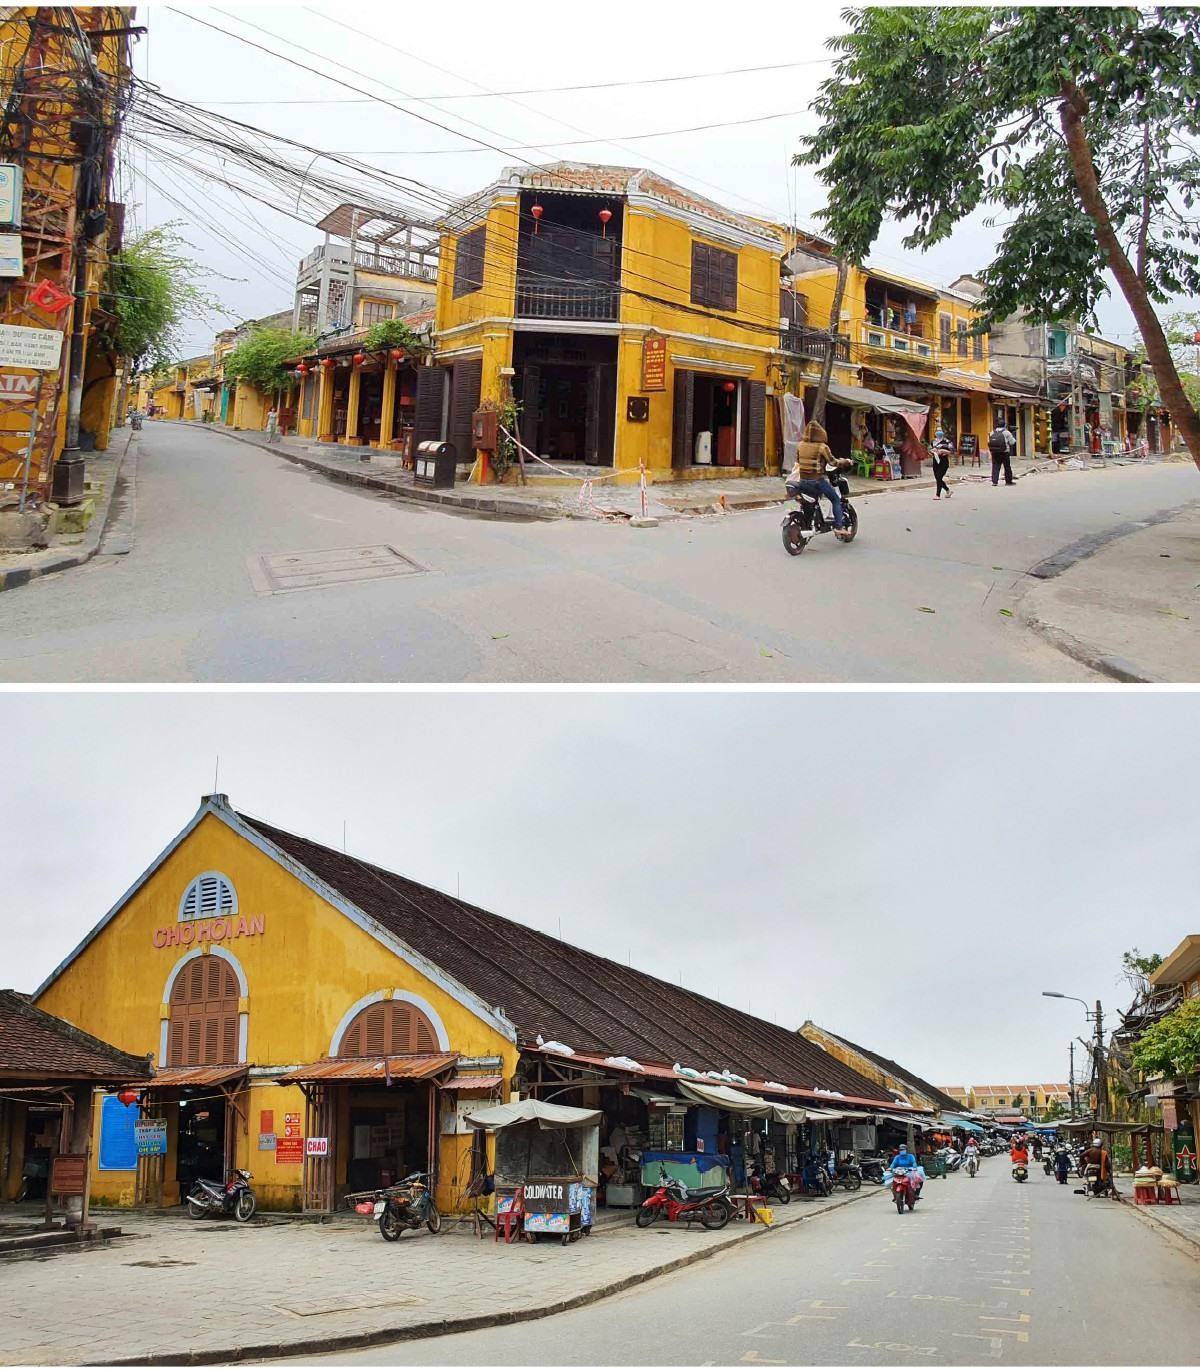 Peacefulness of Hoi An ancient quarter